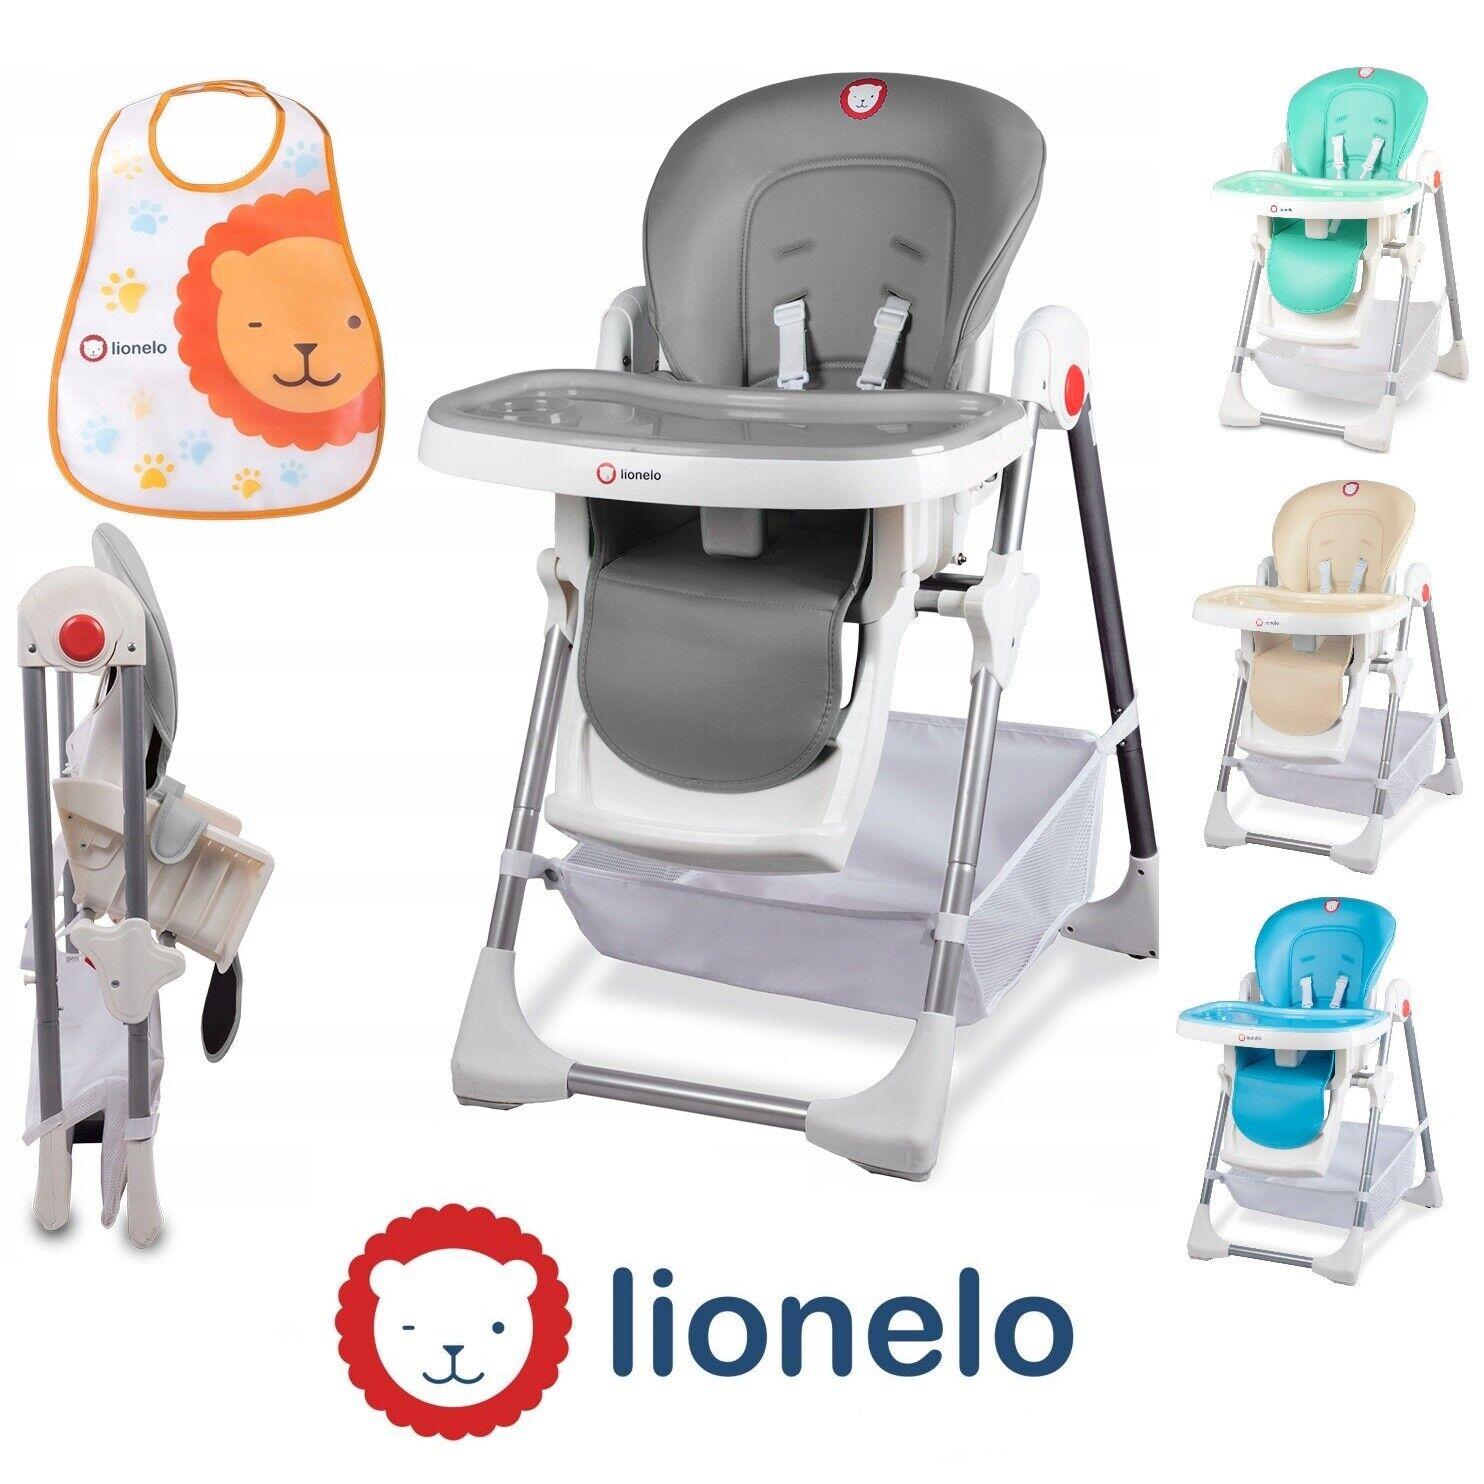 Lionelo Linn Plus Baby Hochstuhl Kinder Stuhl Lehne & Höhe Verstellbar klappbar